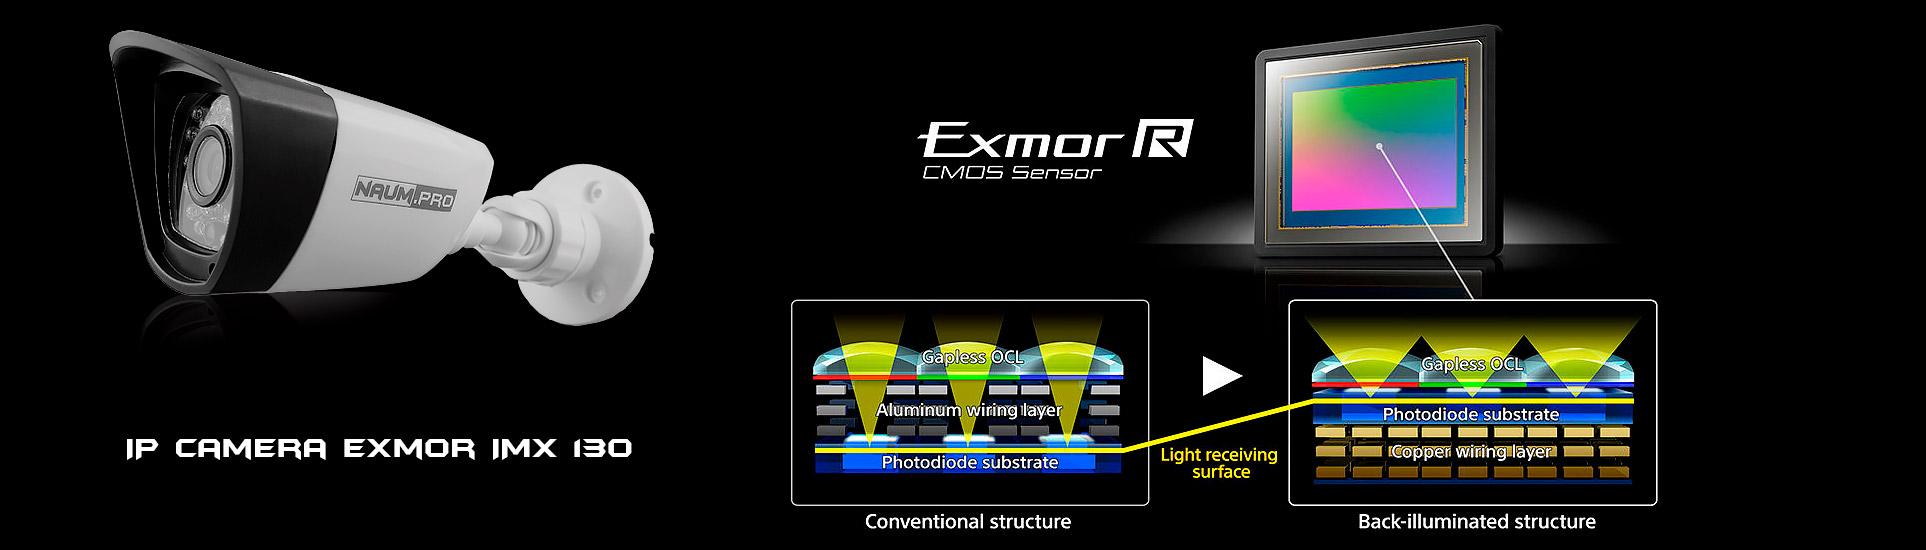 IP камера imx130 банер